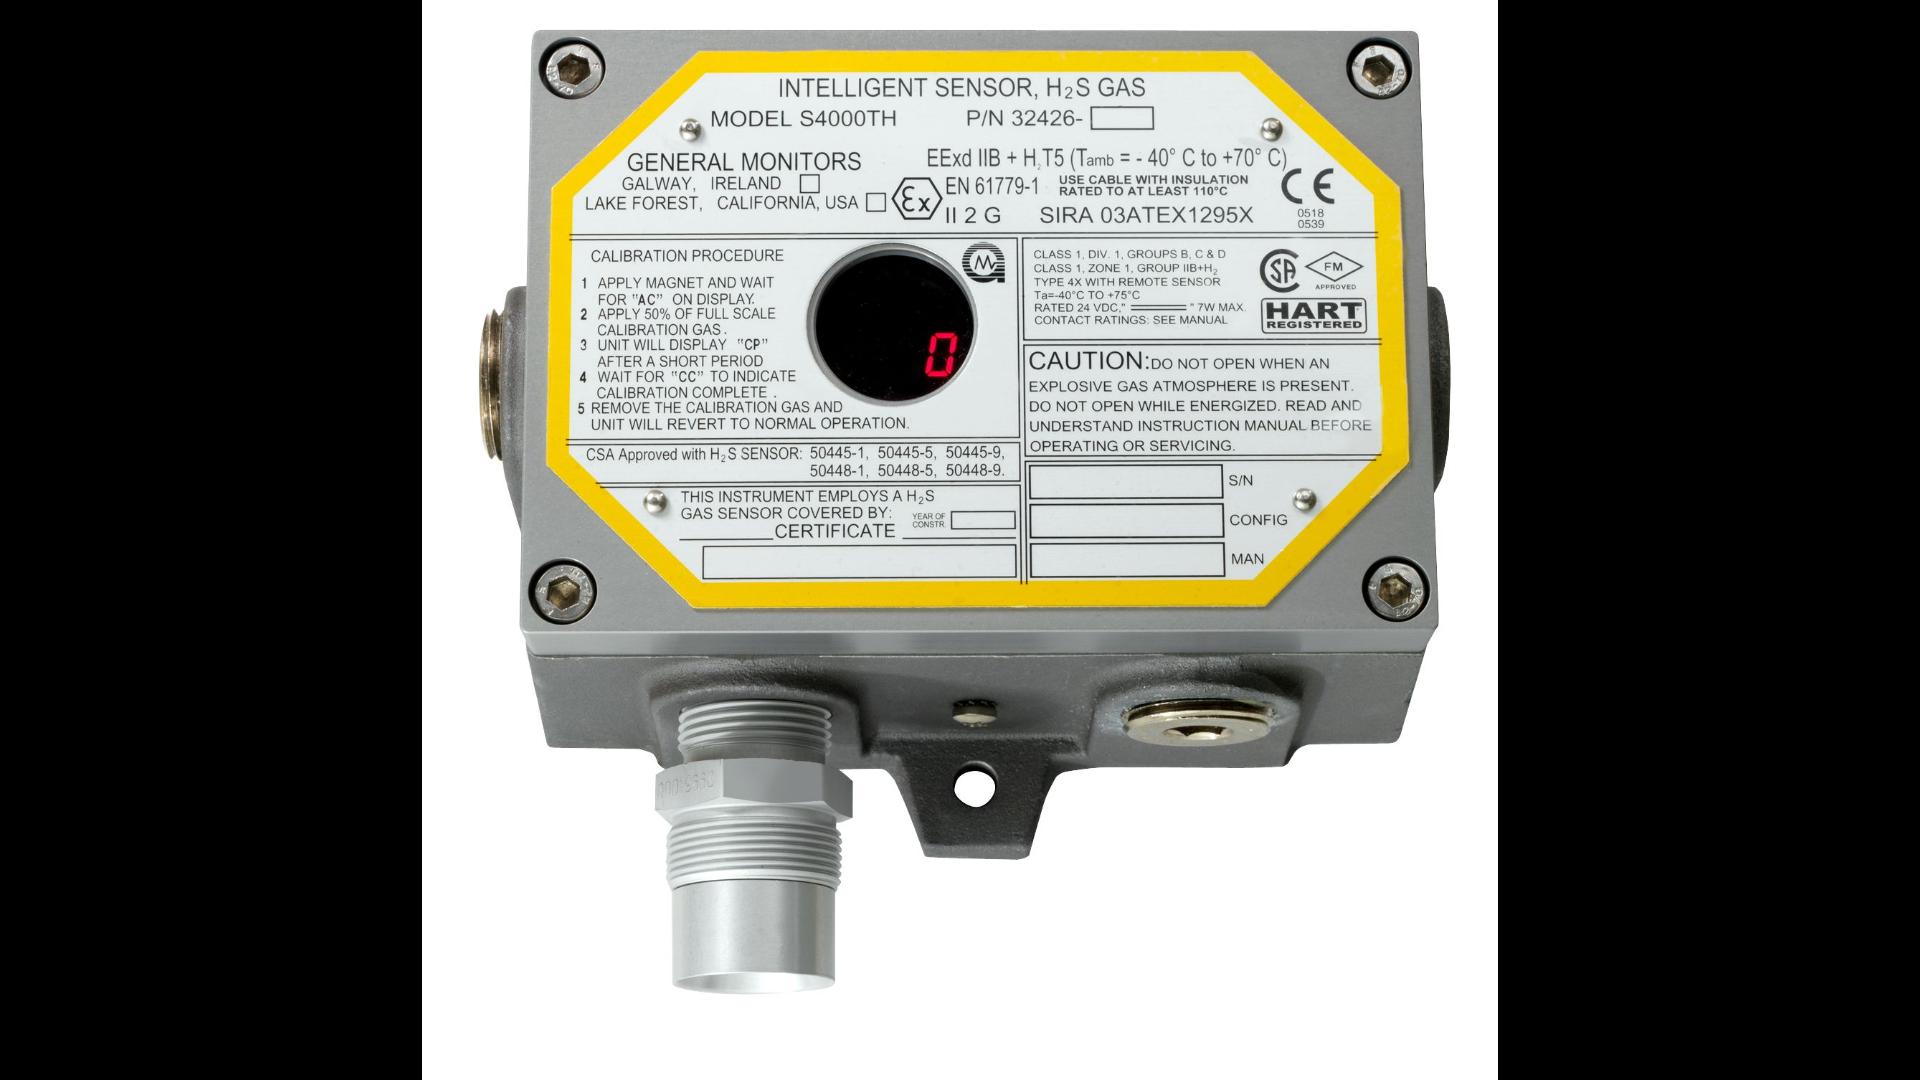 Original Image: General Monitors S4000TH H2S Gas Detector